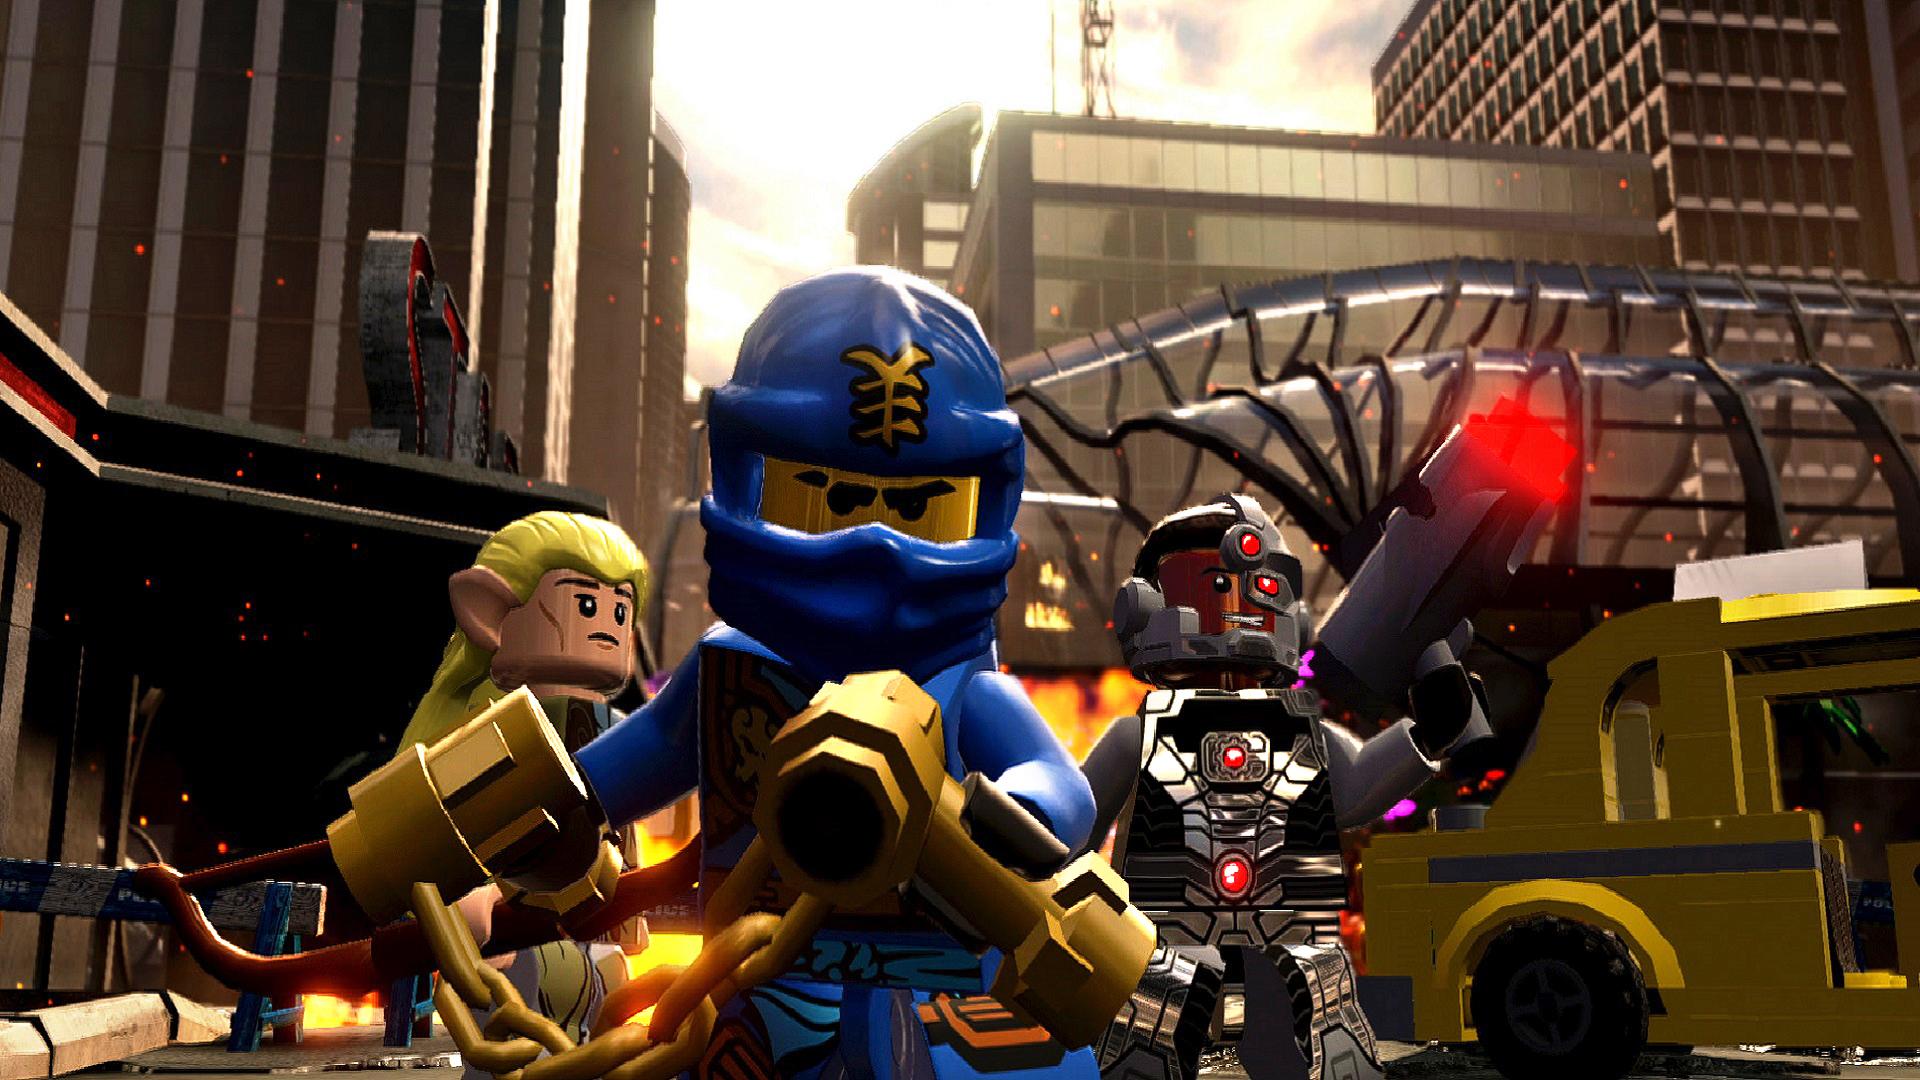 Dobrodružství v Lego Dimensions se rozběhne na podzim 107838